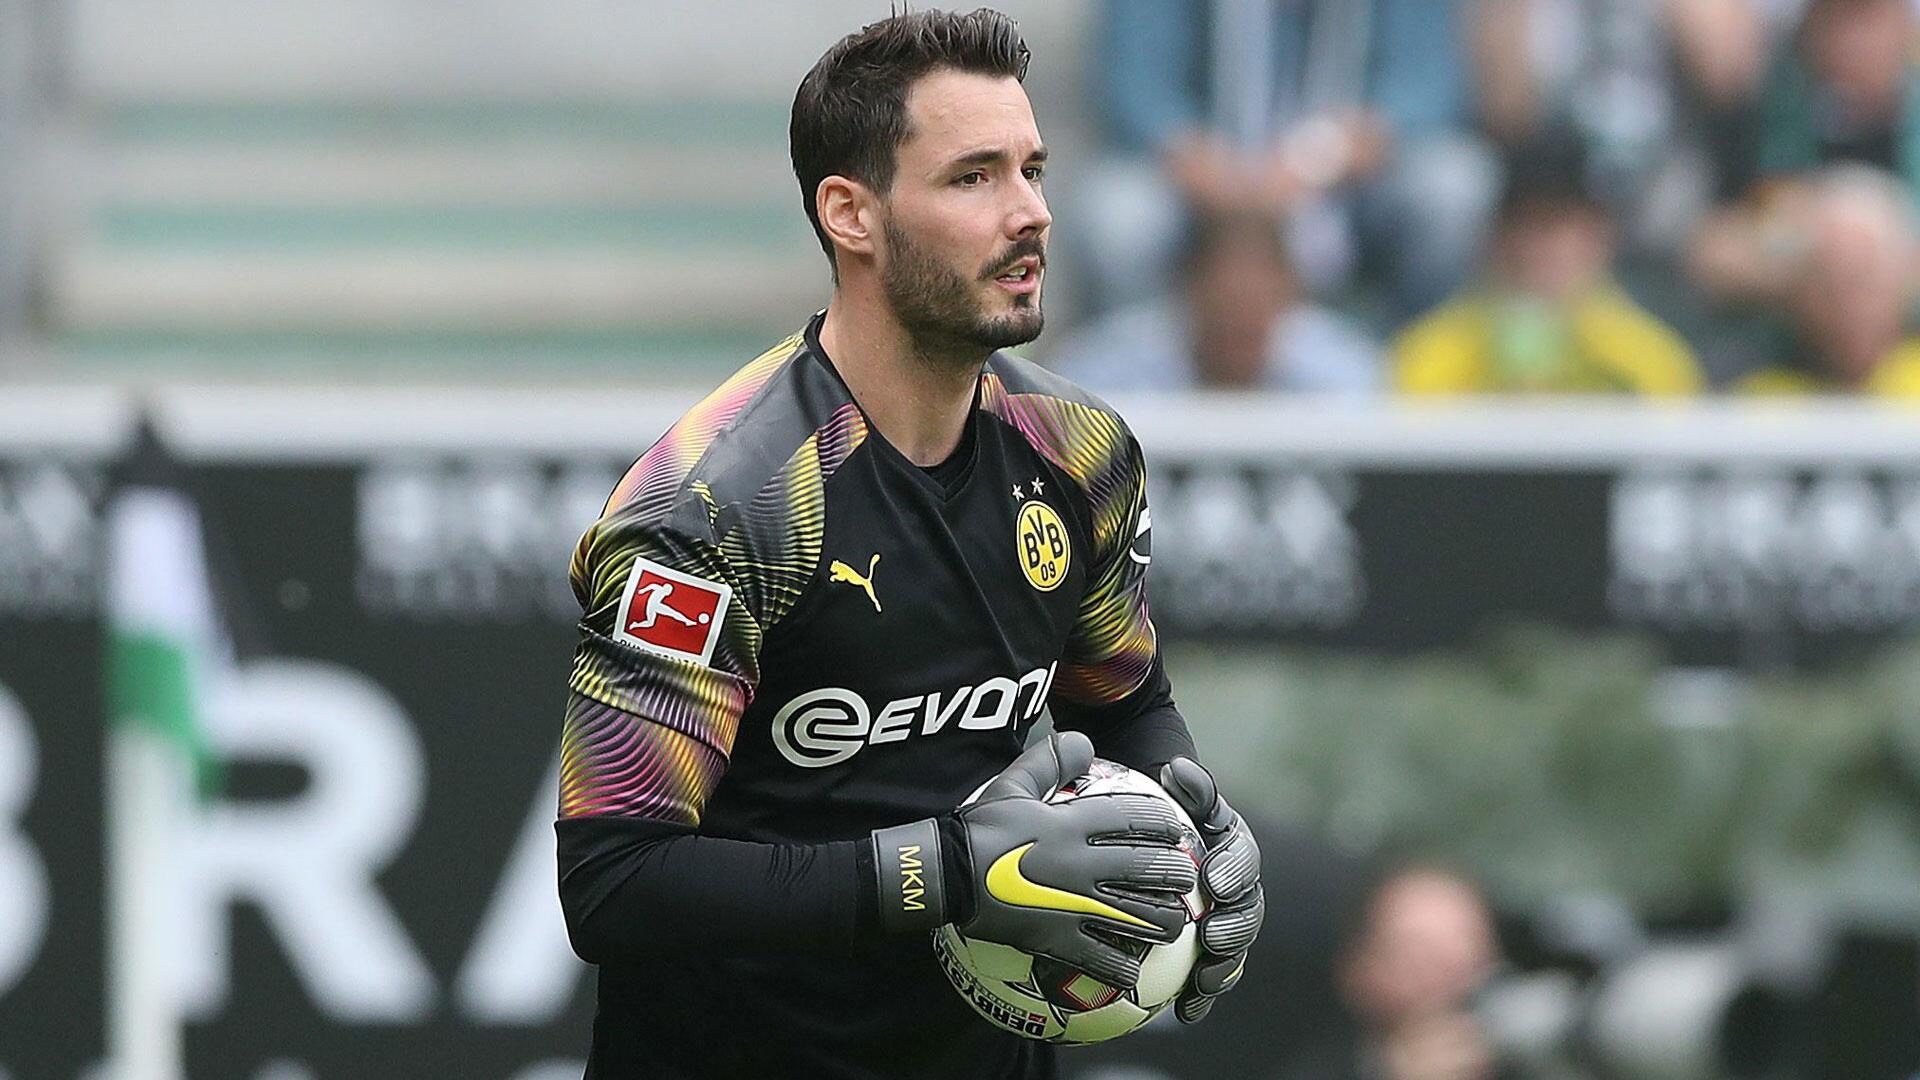 Bild zu Roman Bürki, Borussia Dortmund, Borussia Mönchengladbach, Bundesliga